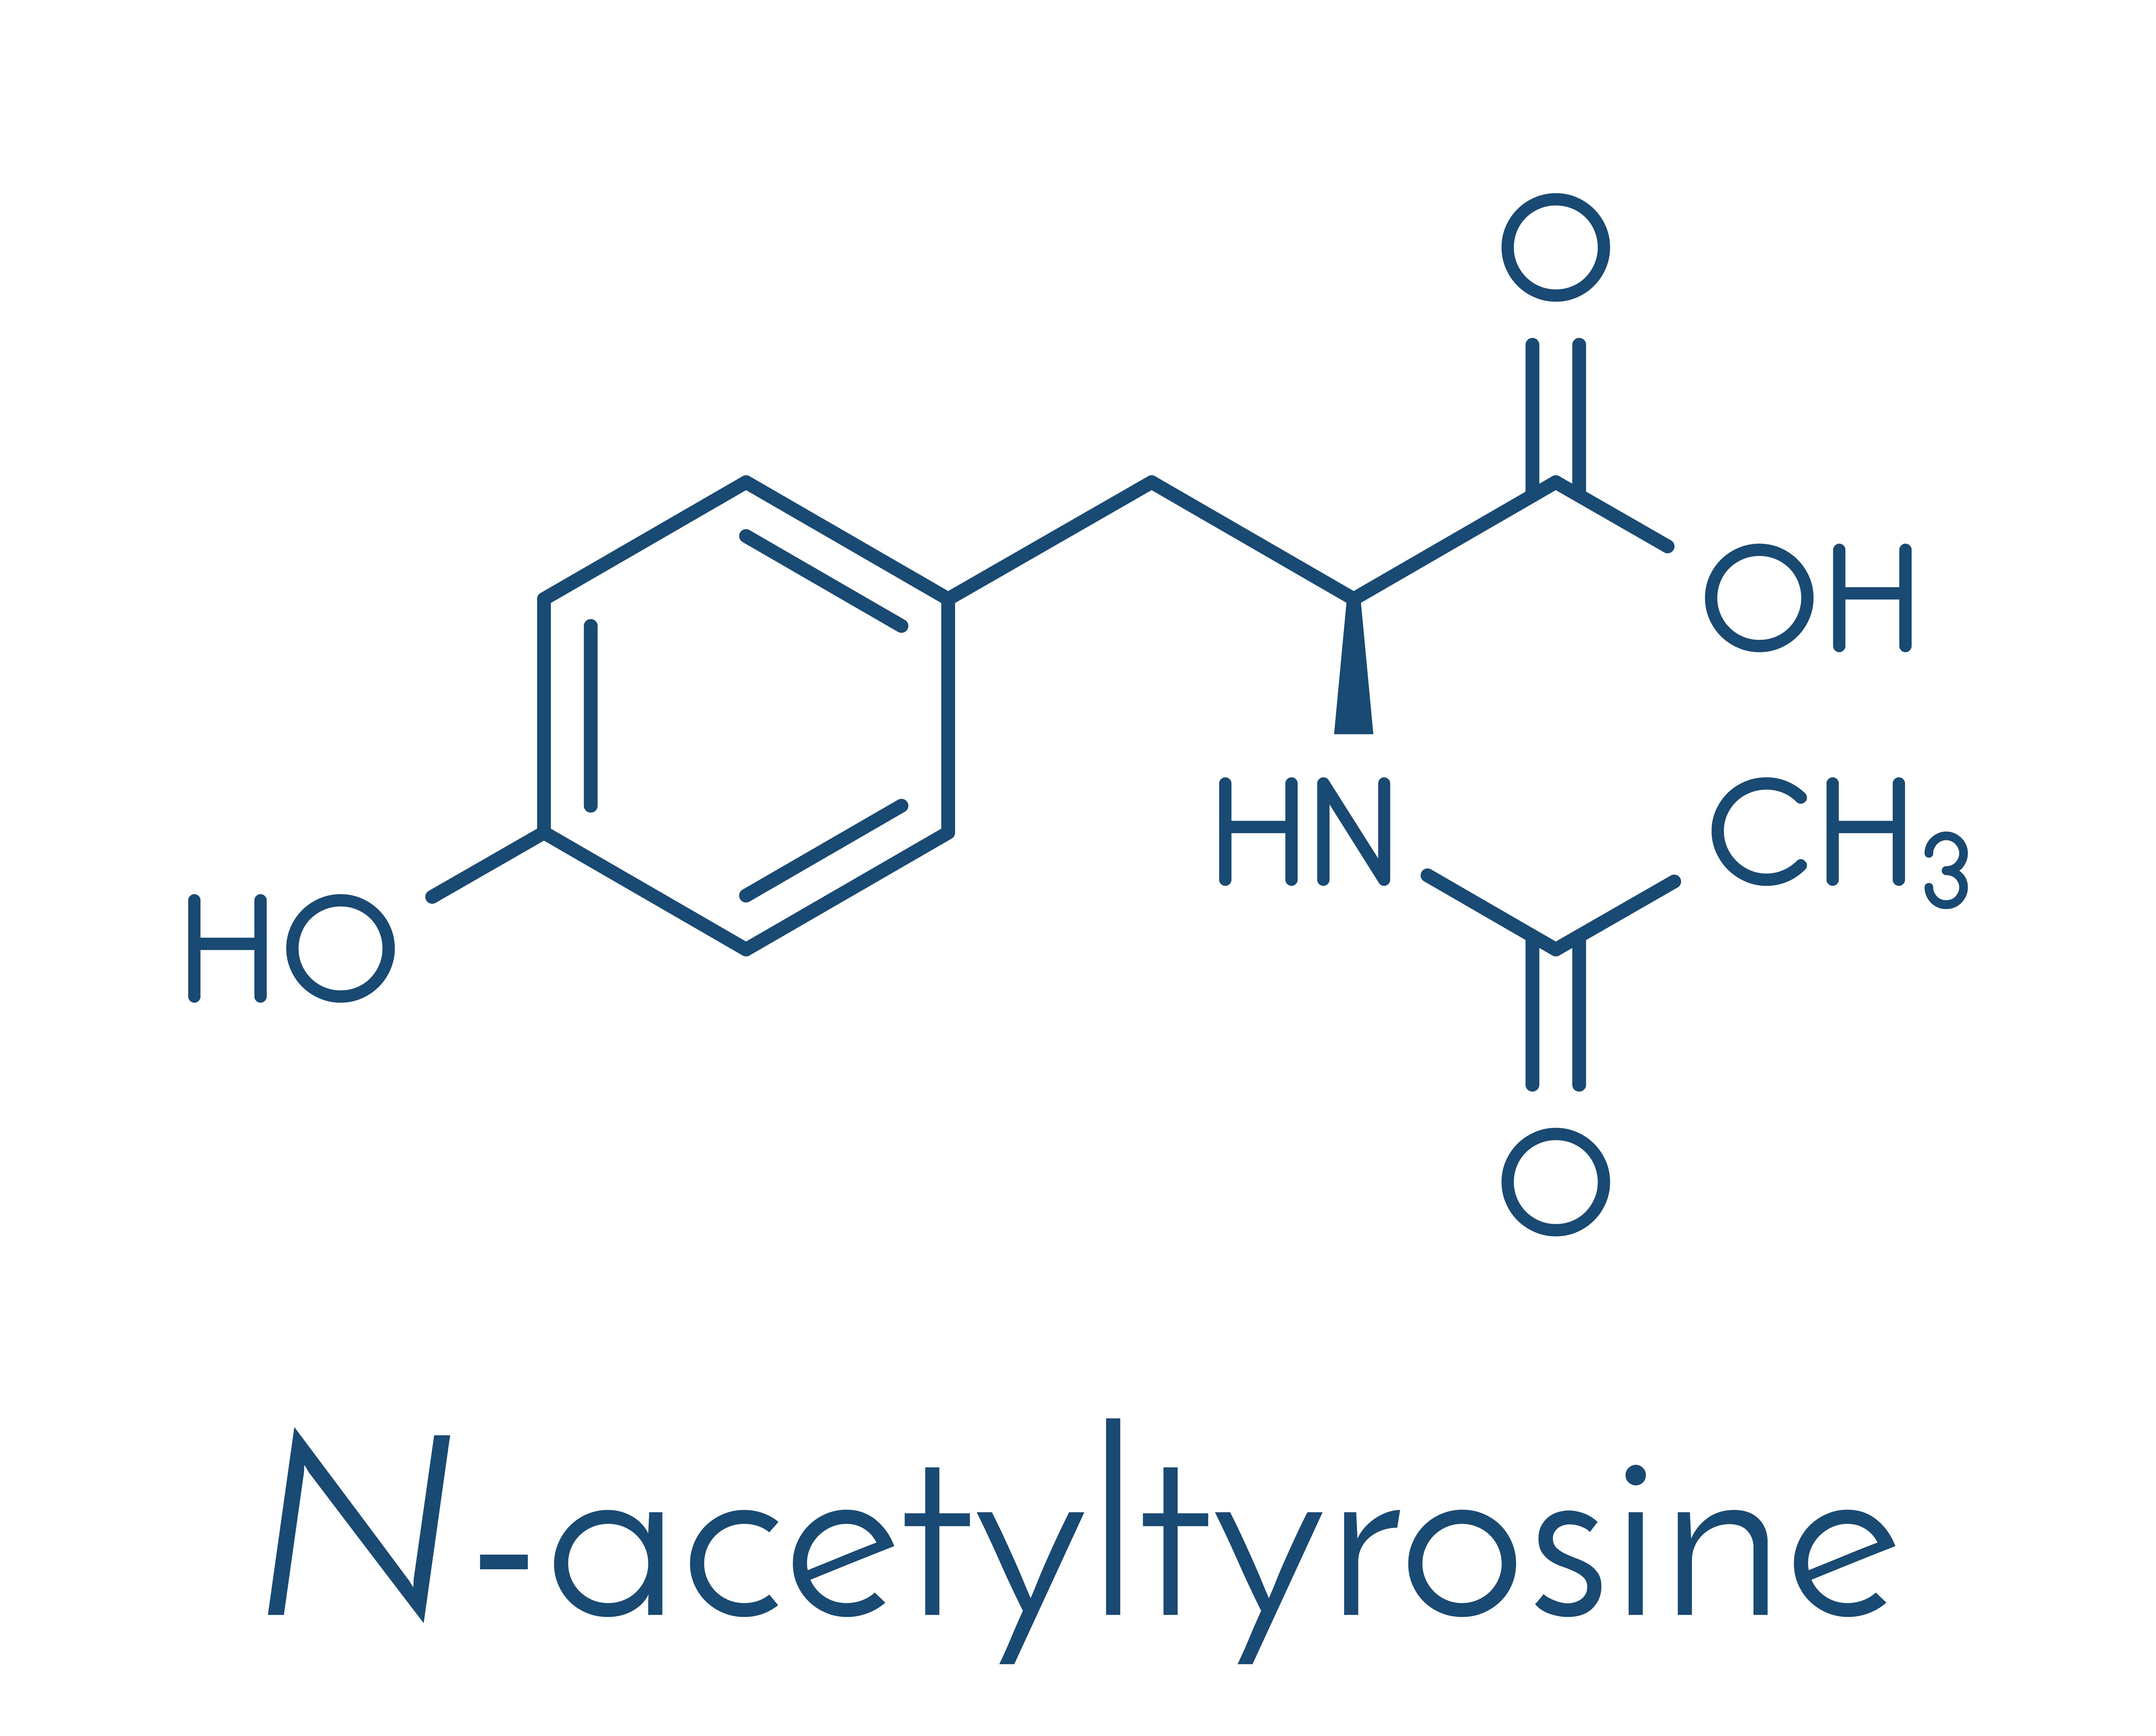 NALT (N-acetyltyrosine) - optimal form of tyrosine